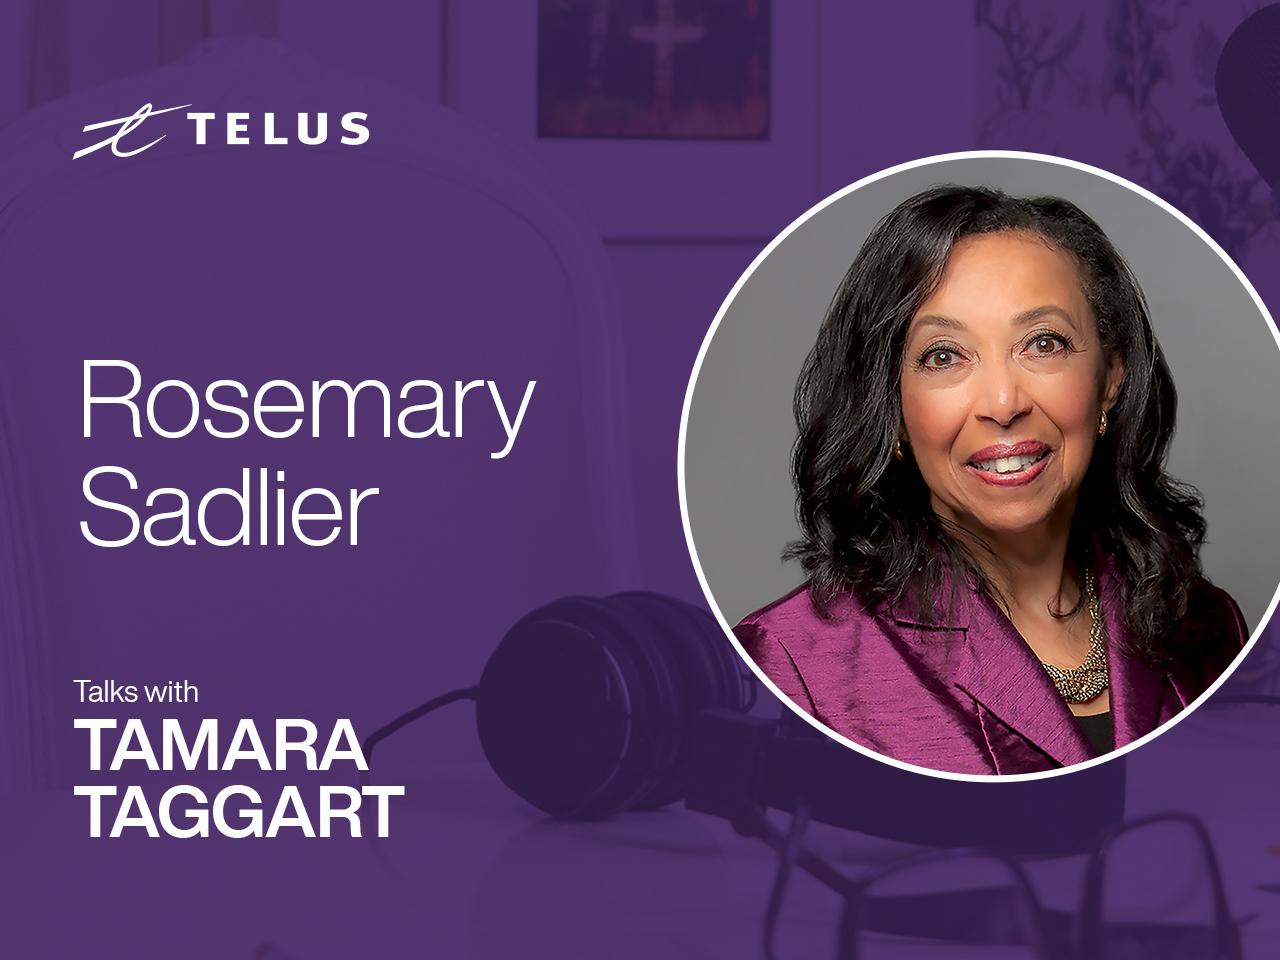 Author, educator and past president of the Ontario Black History Society, Rosemary Sadlier